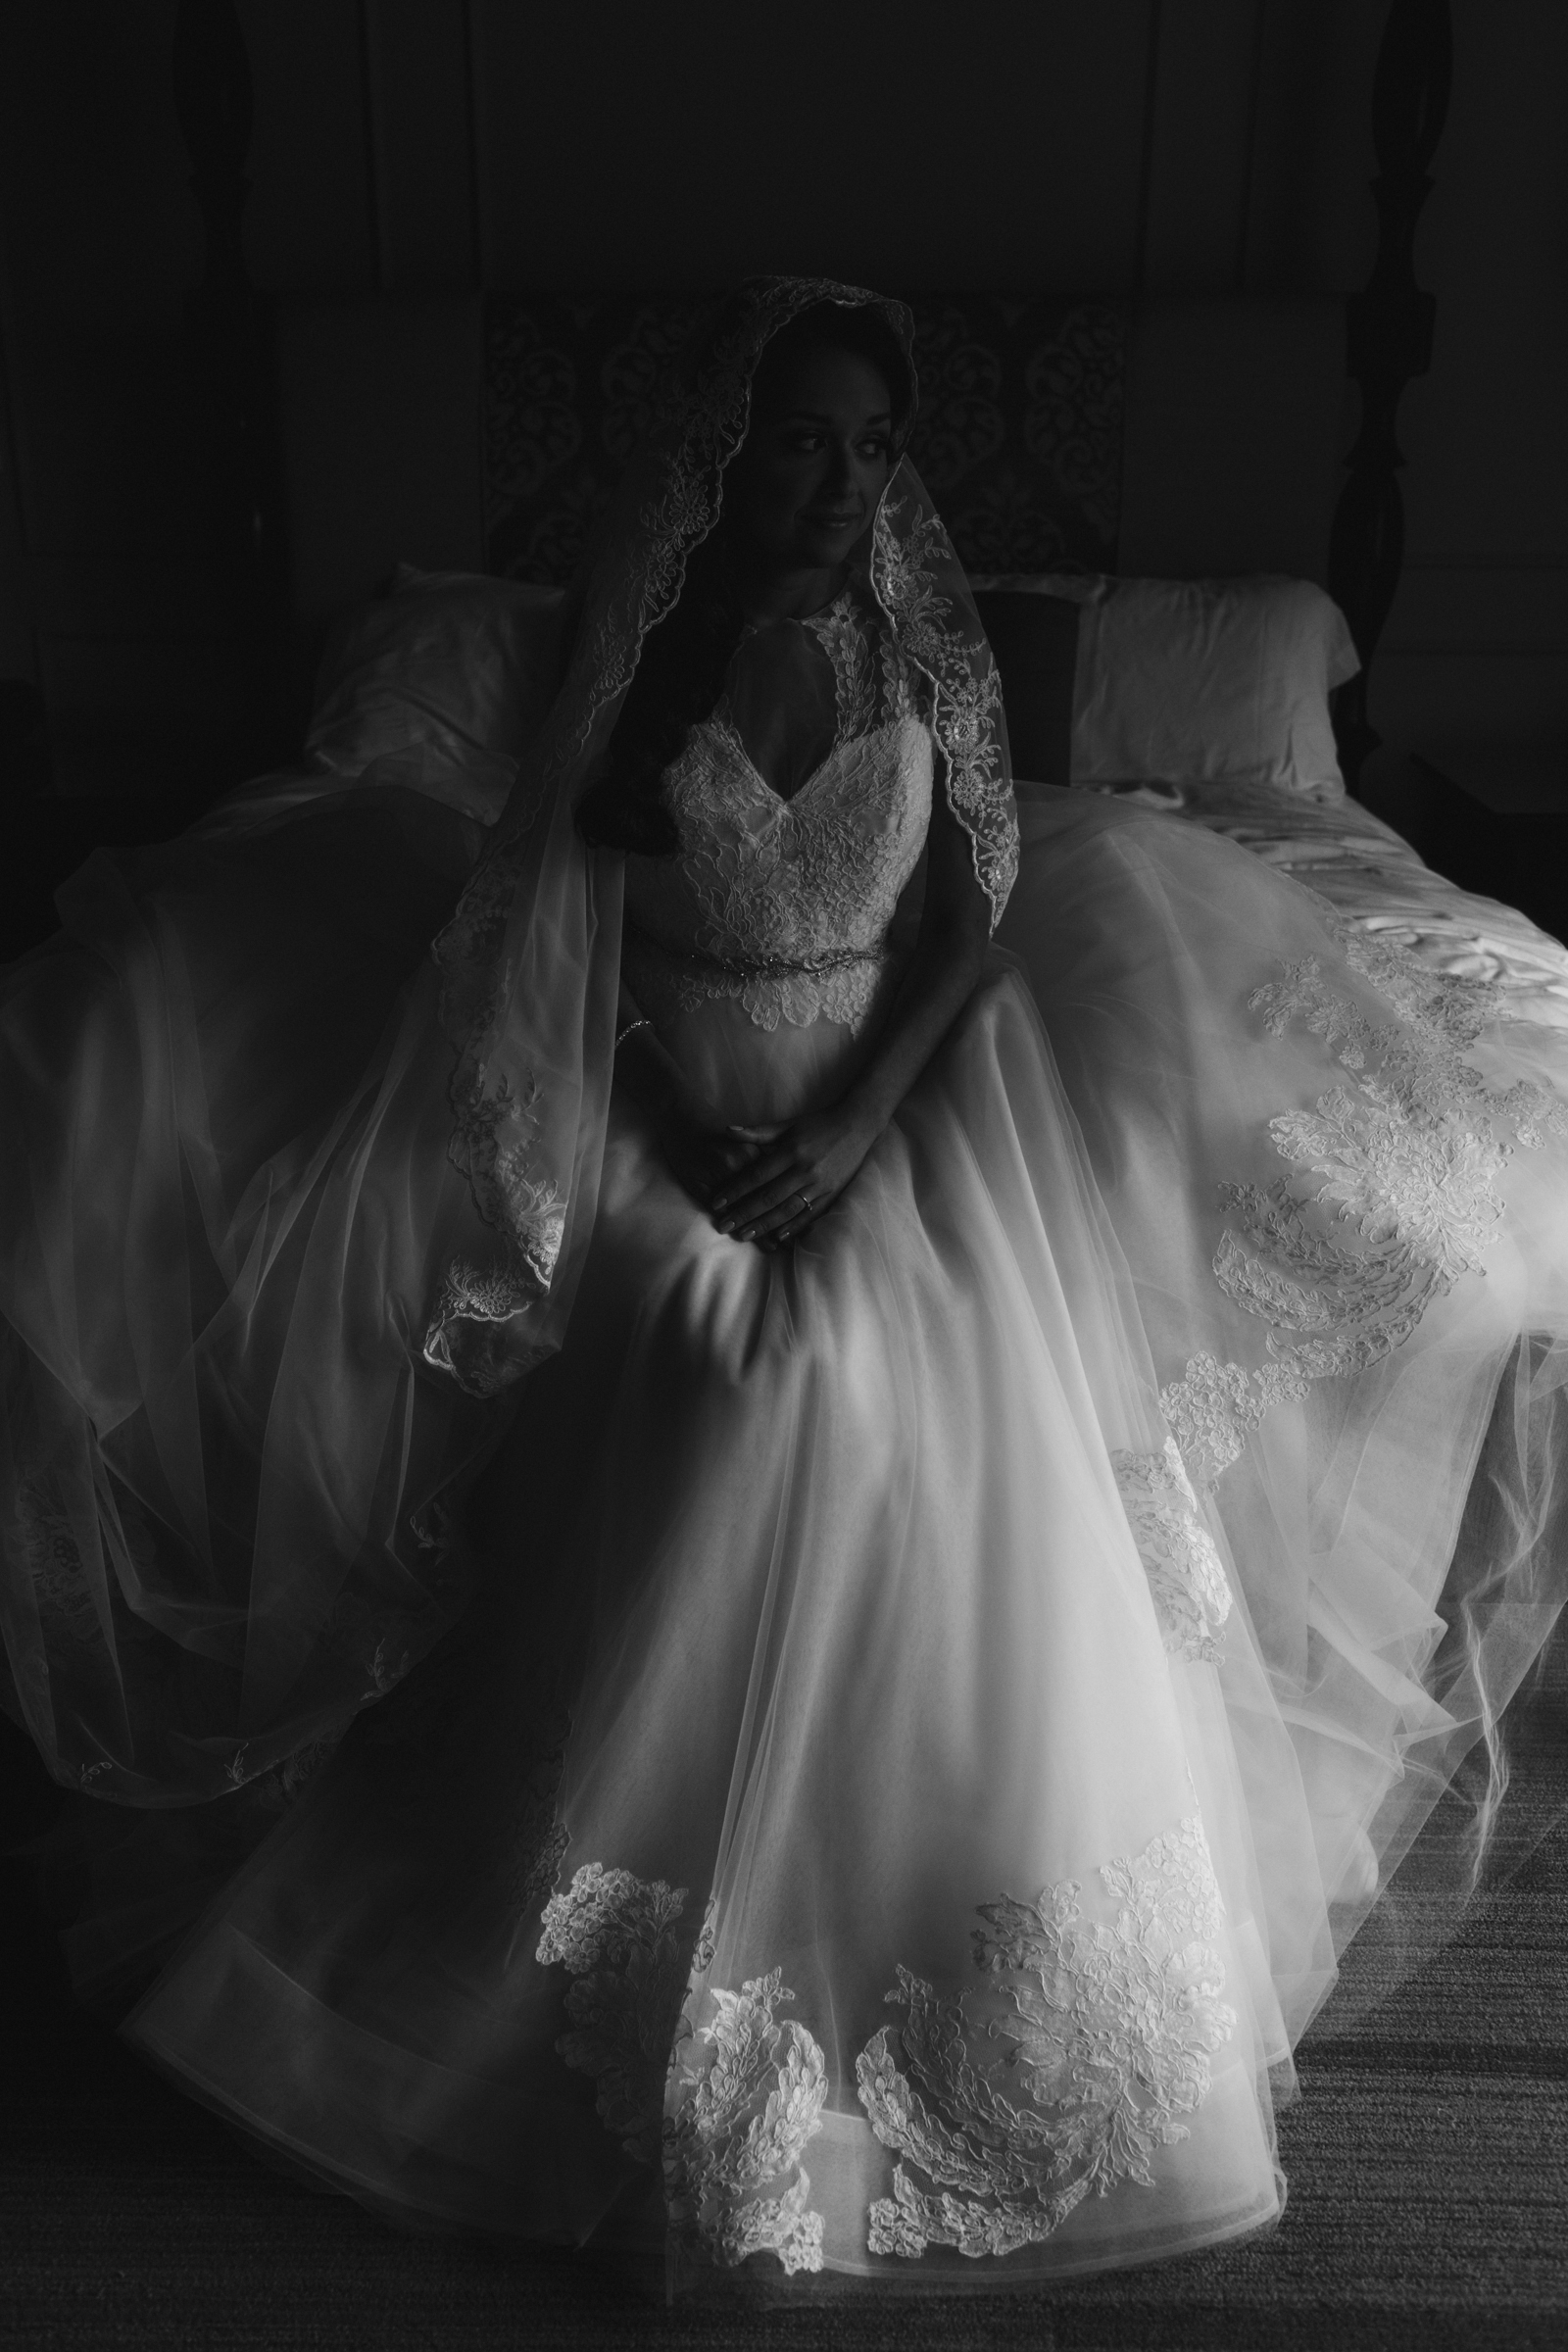 wedding day | MFA St Pete | Vanessa Boy Photography | vanessaboy.com-104.com |final.jpg